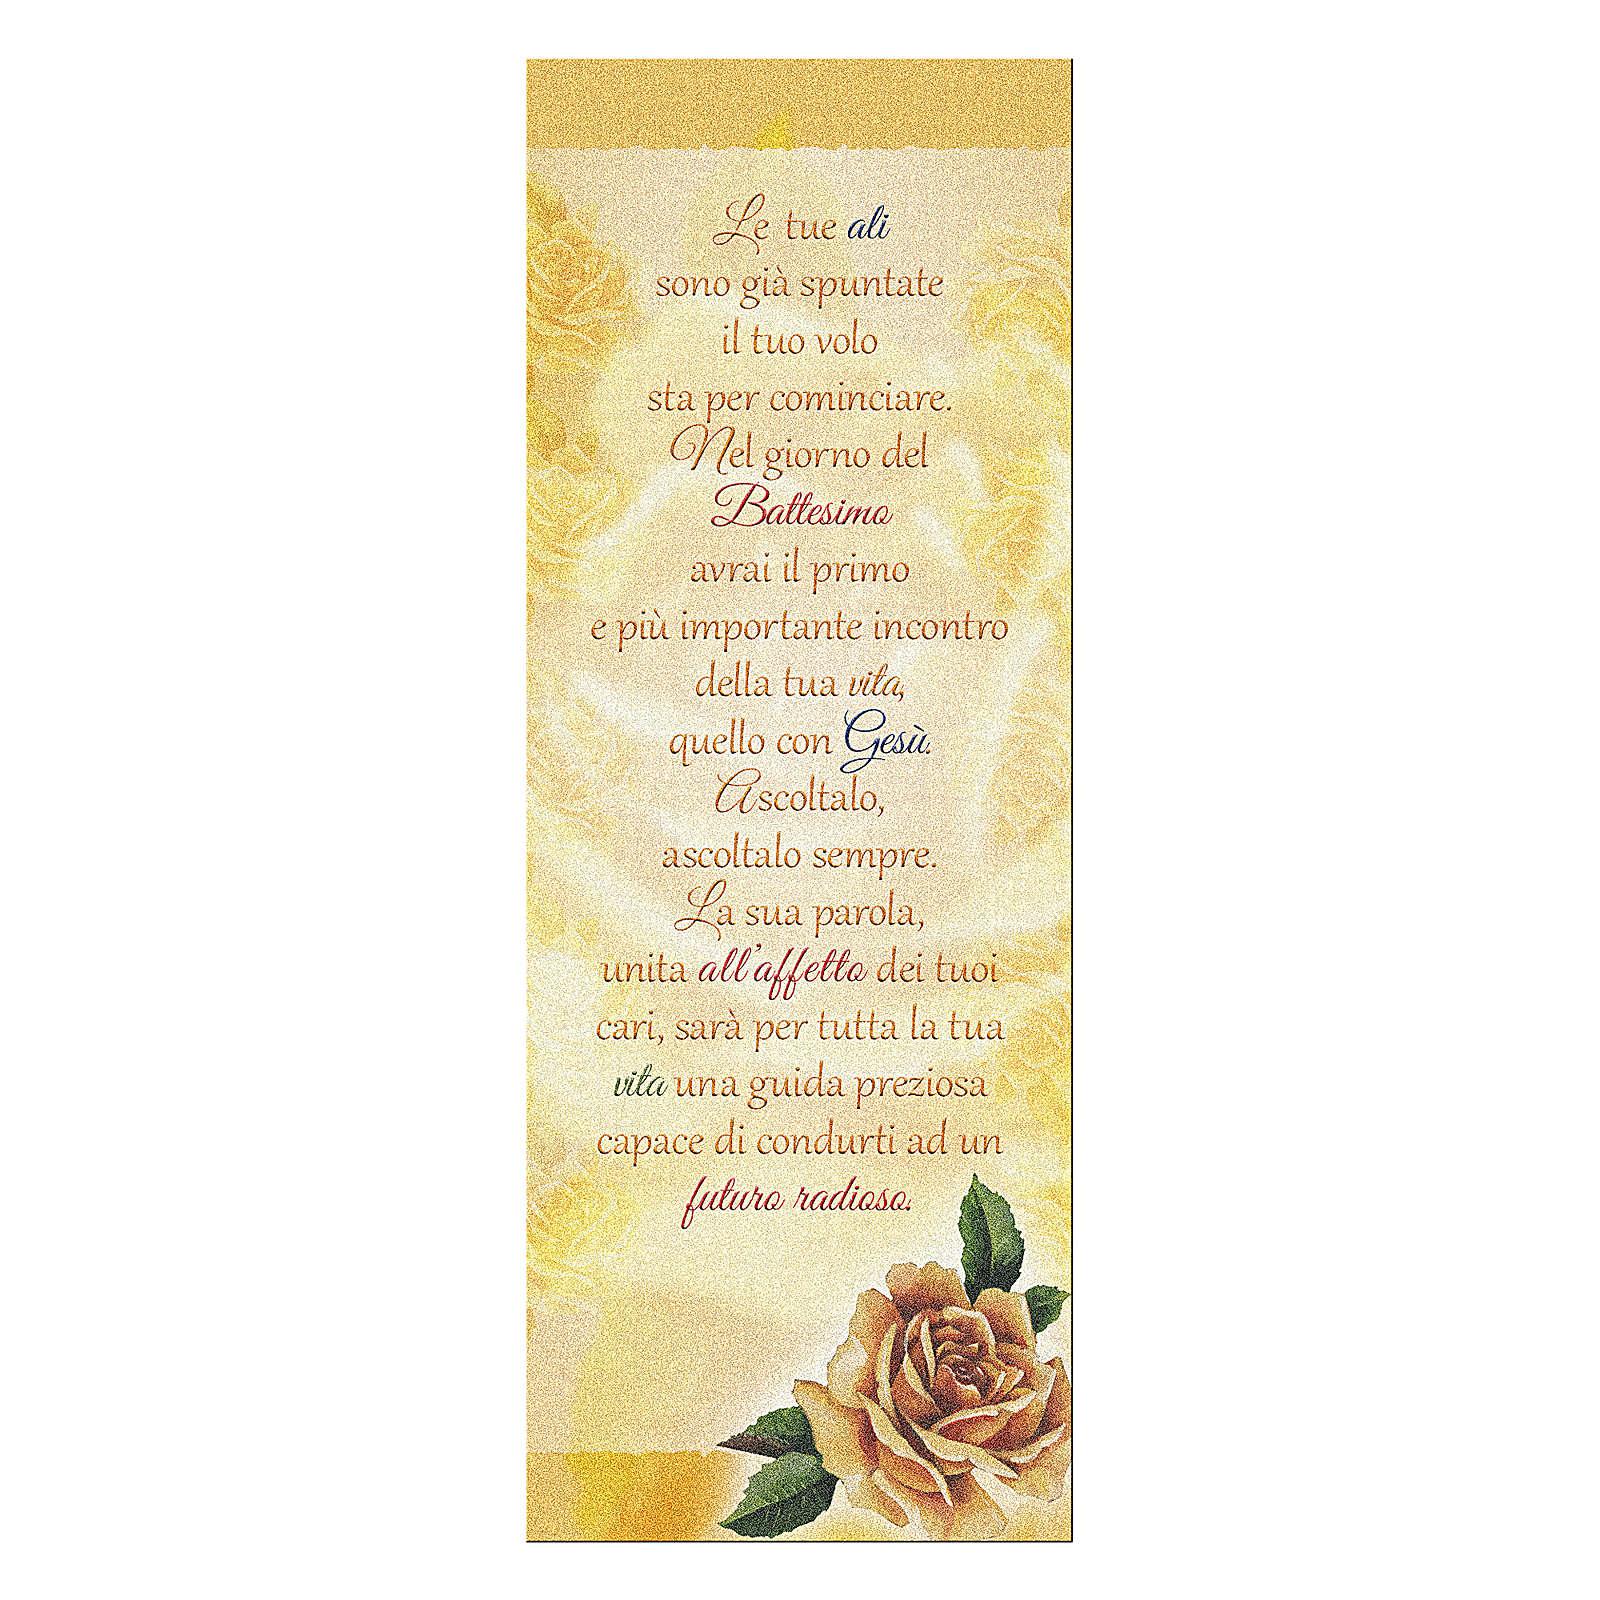 Segnalibro carta perlata Rosa Gialla Auguri Battesimo 15x5 cm 4